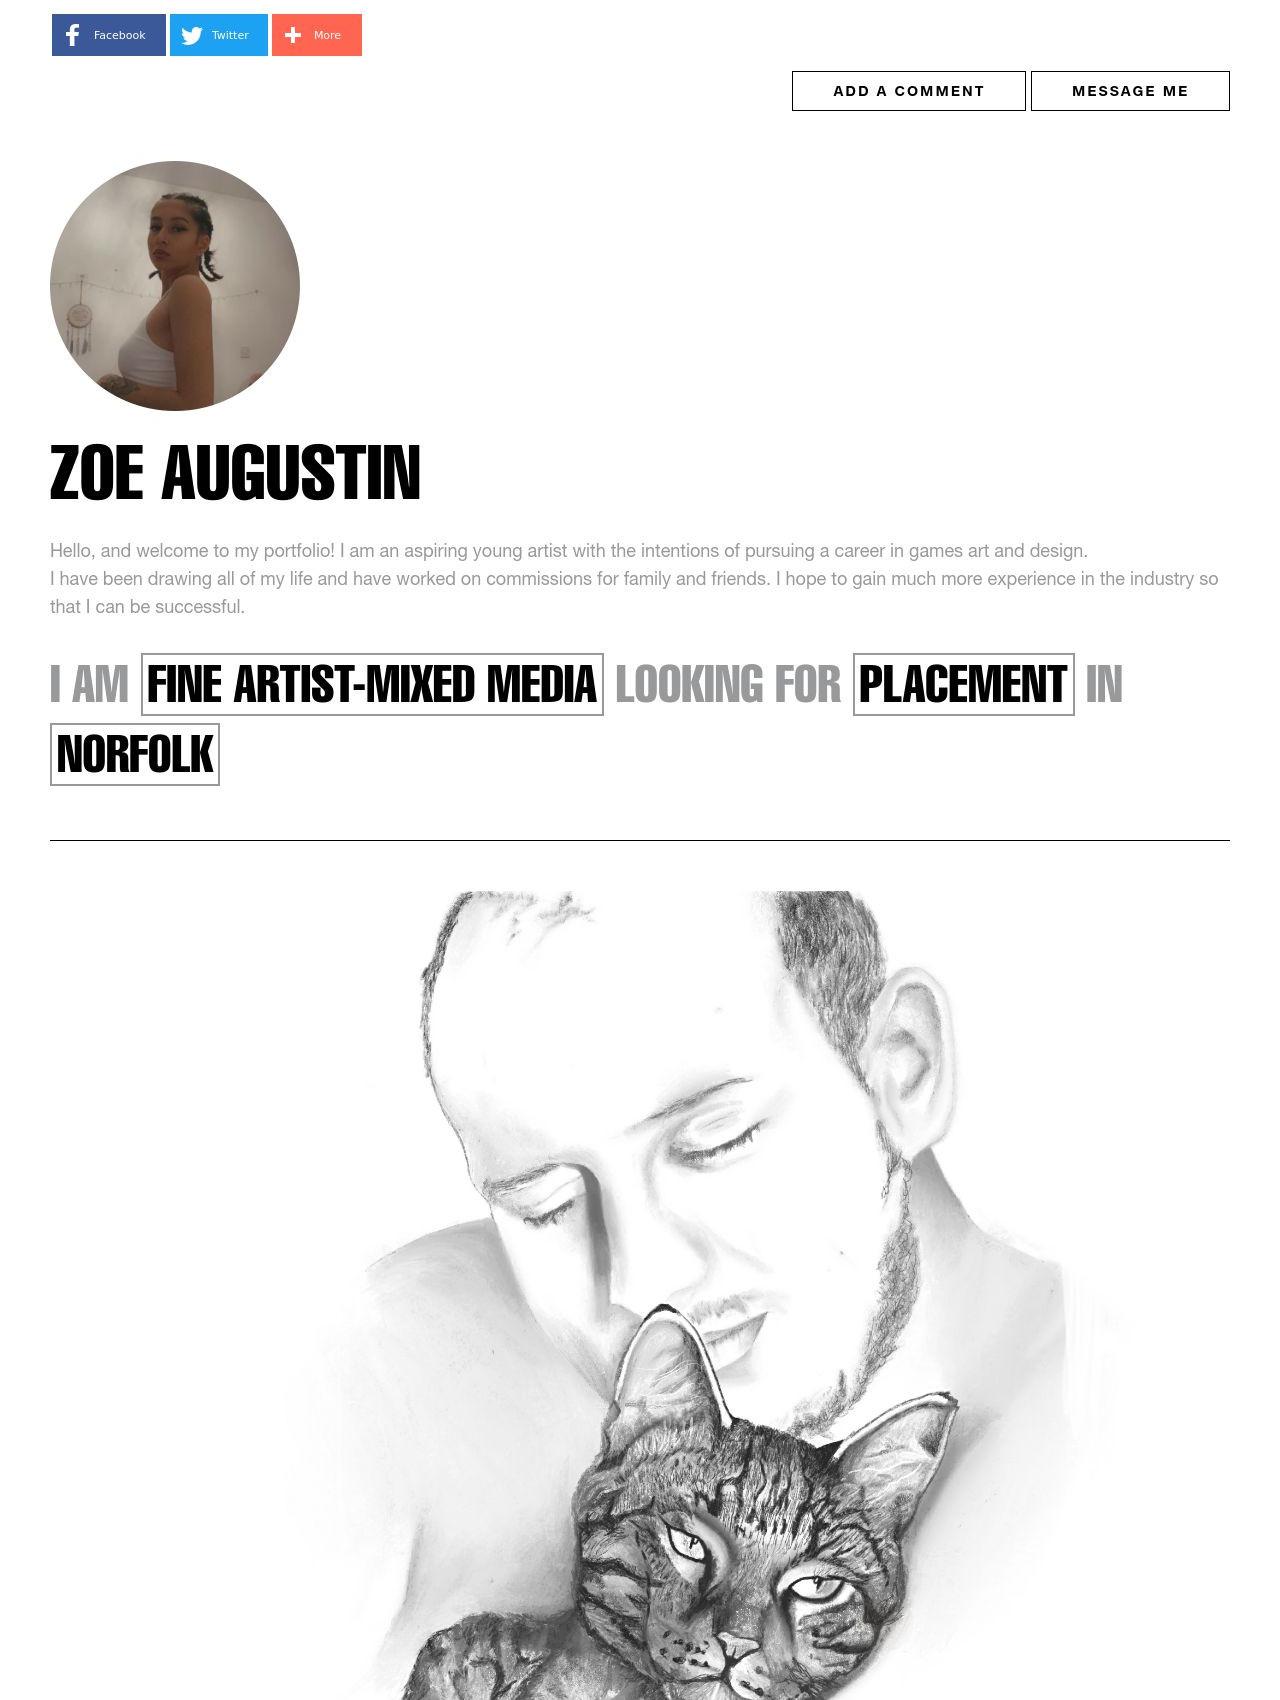 Zoe Augustin